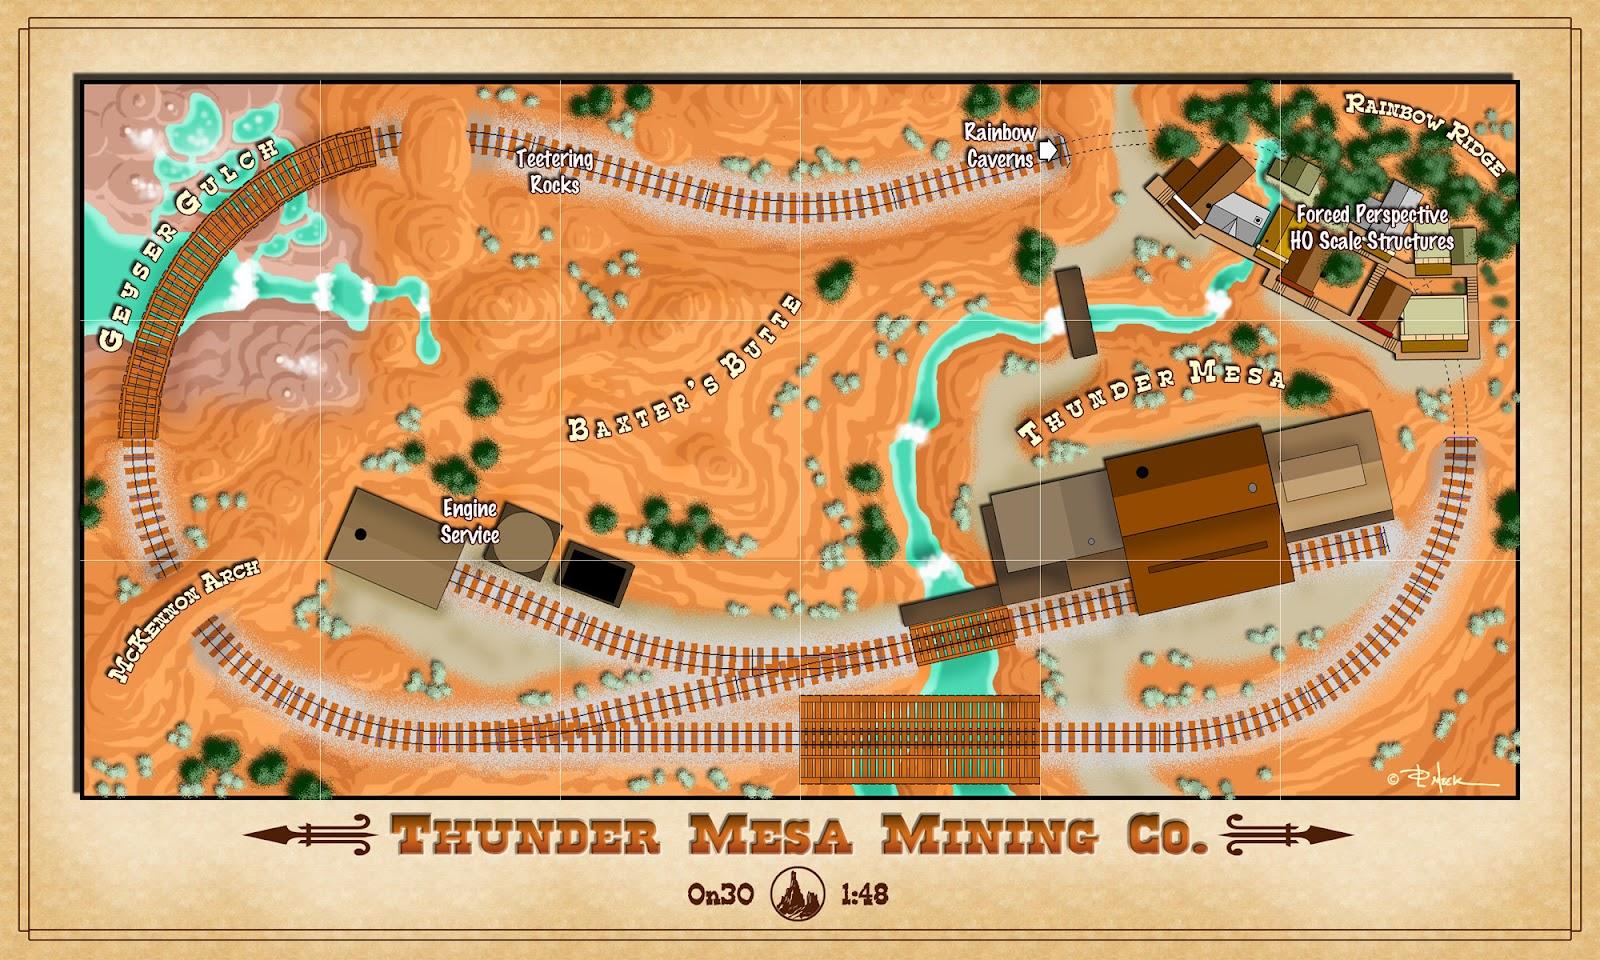 Thunder mesa mining co a plan for thunder mesa